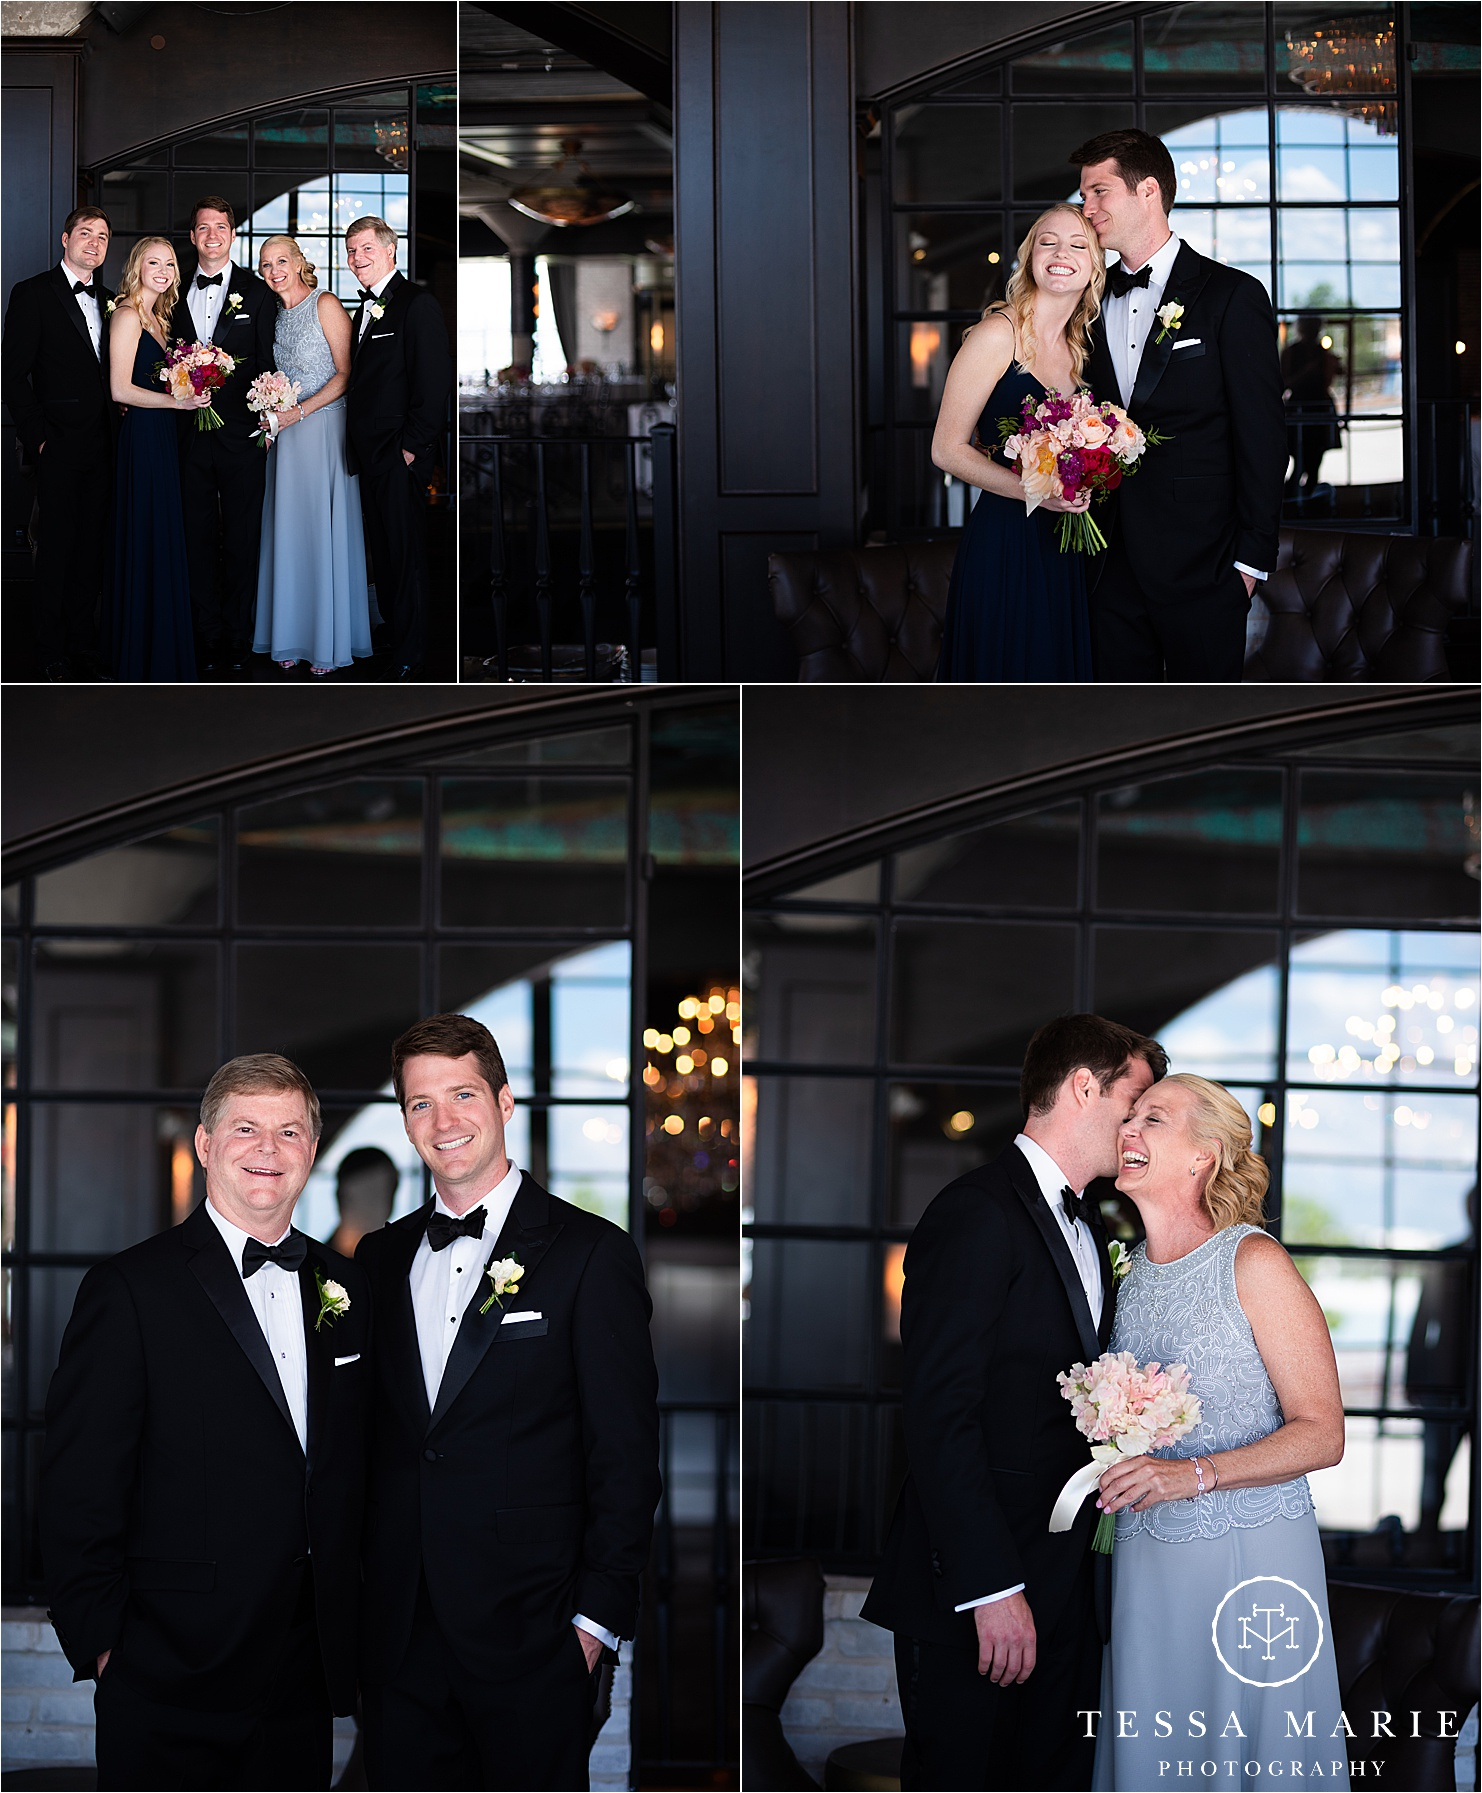 Tessa_marie_weddings_houston_wedding_photographer_The_astorian_0091.jpg